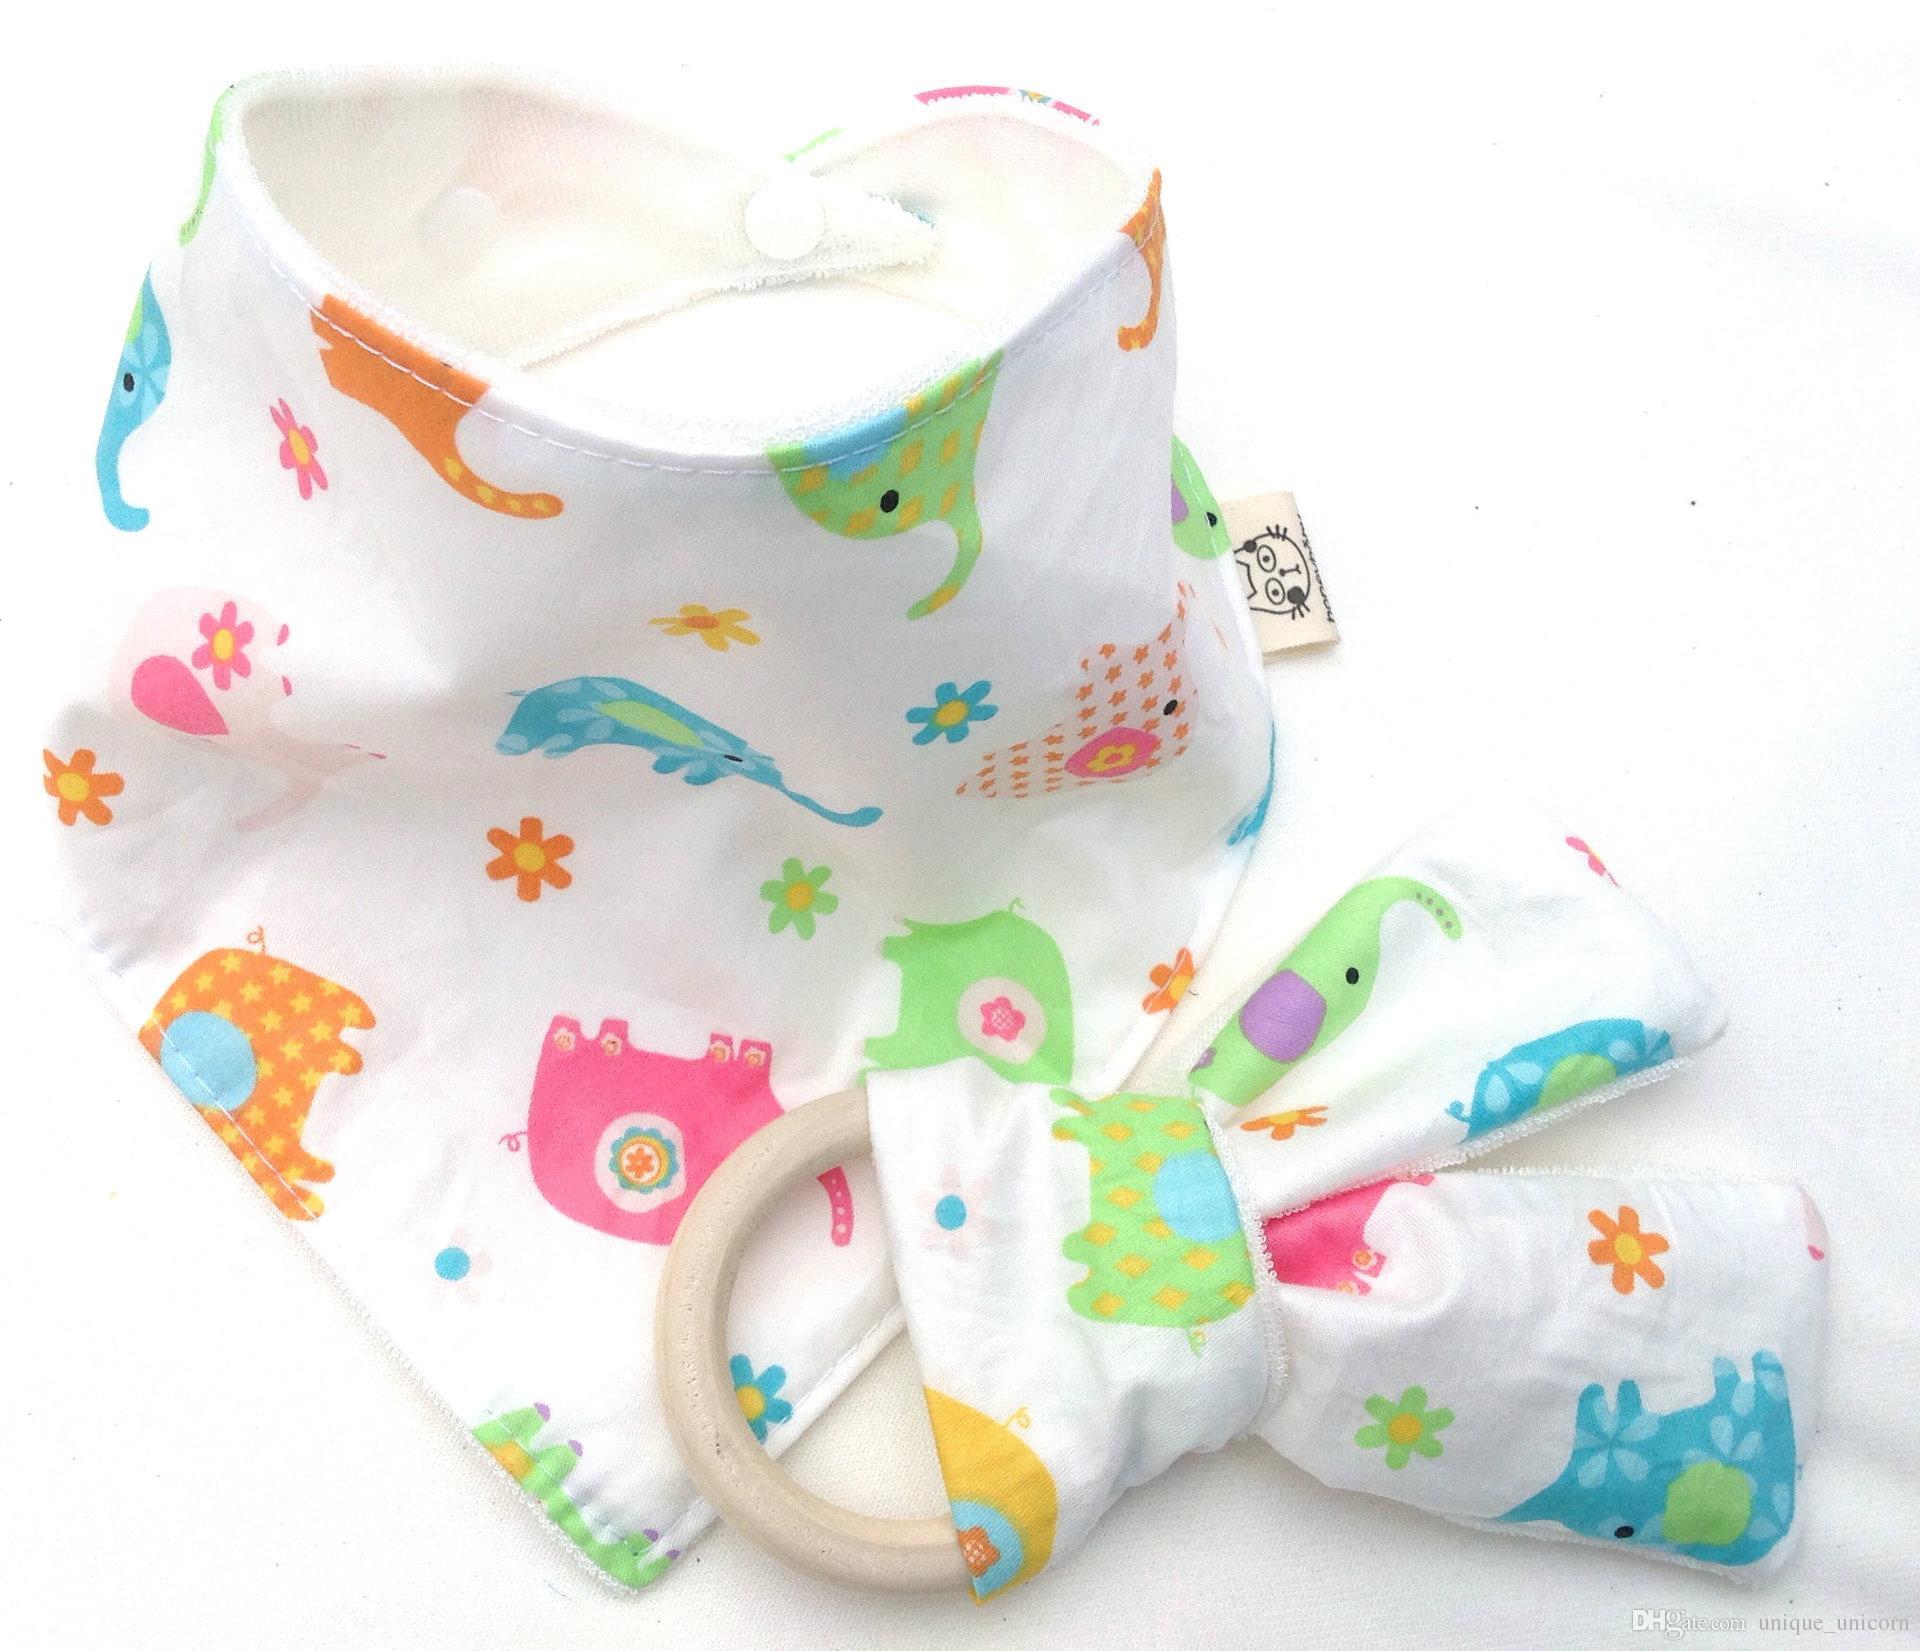 Baby Teether Teething Ring Baby Wooden Teething training+baby broken flower zig zag waterproof triangular bandage Buckle sets